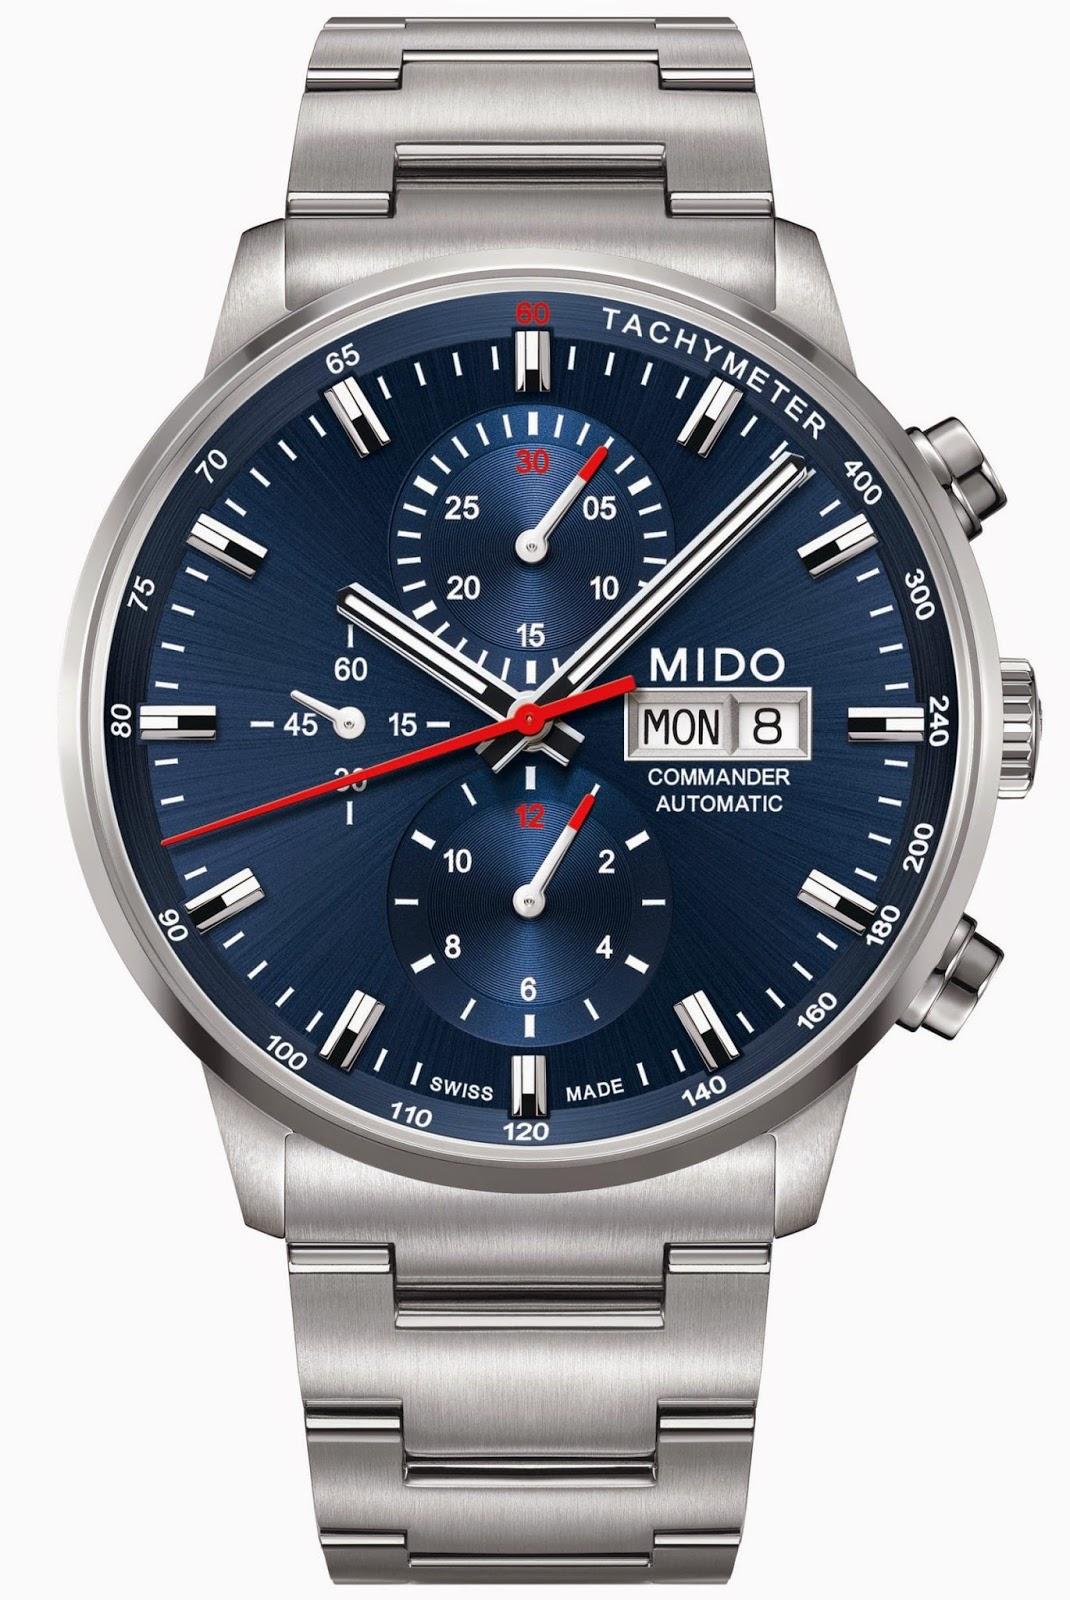 Mido - [News] Mido Multifort 80 Mido%2BCommander%2BChronograph%2BCaliber%2B60%2B%2B-2